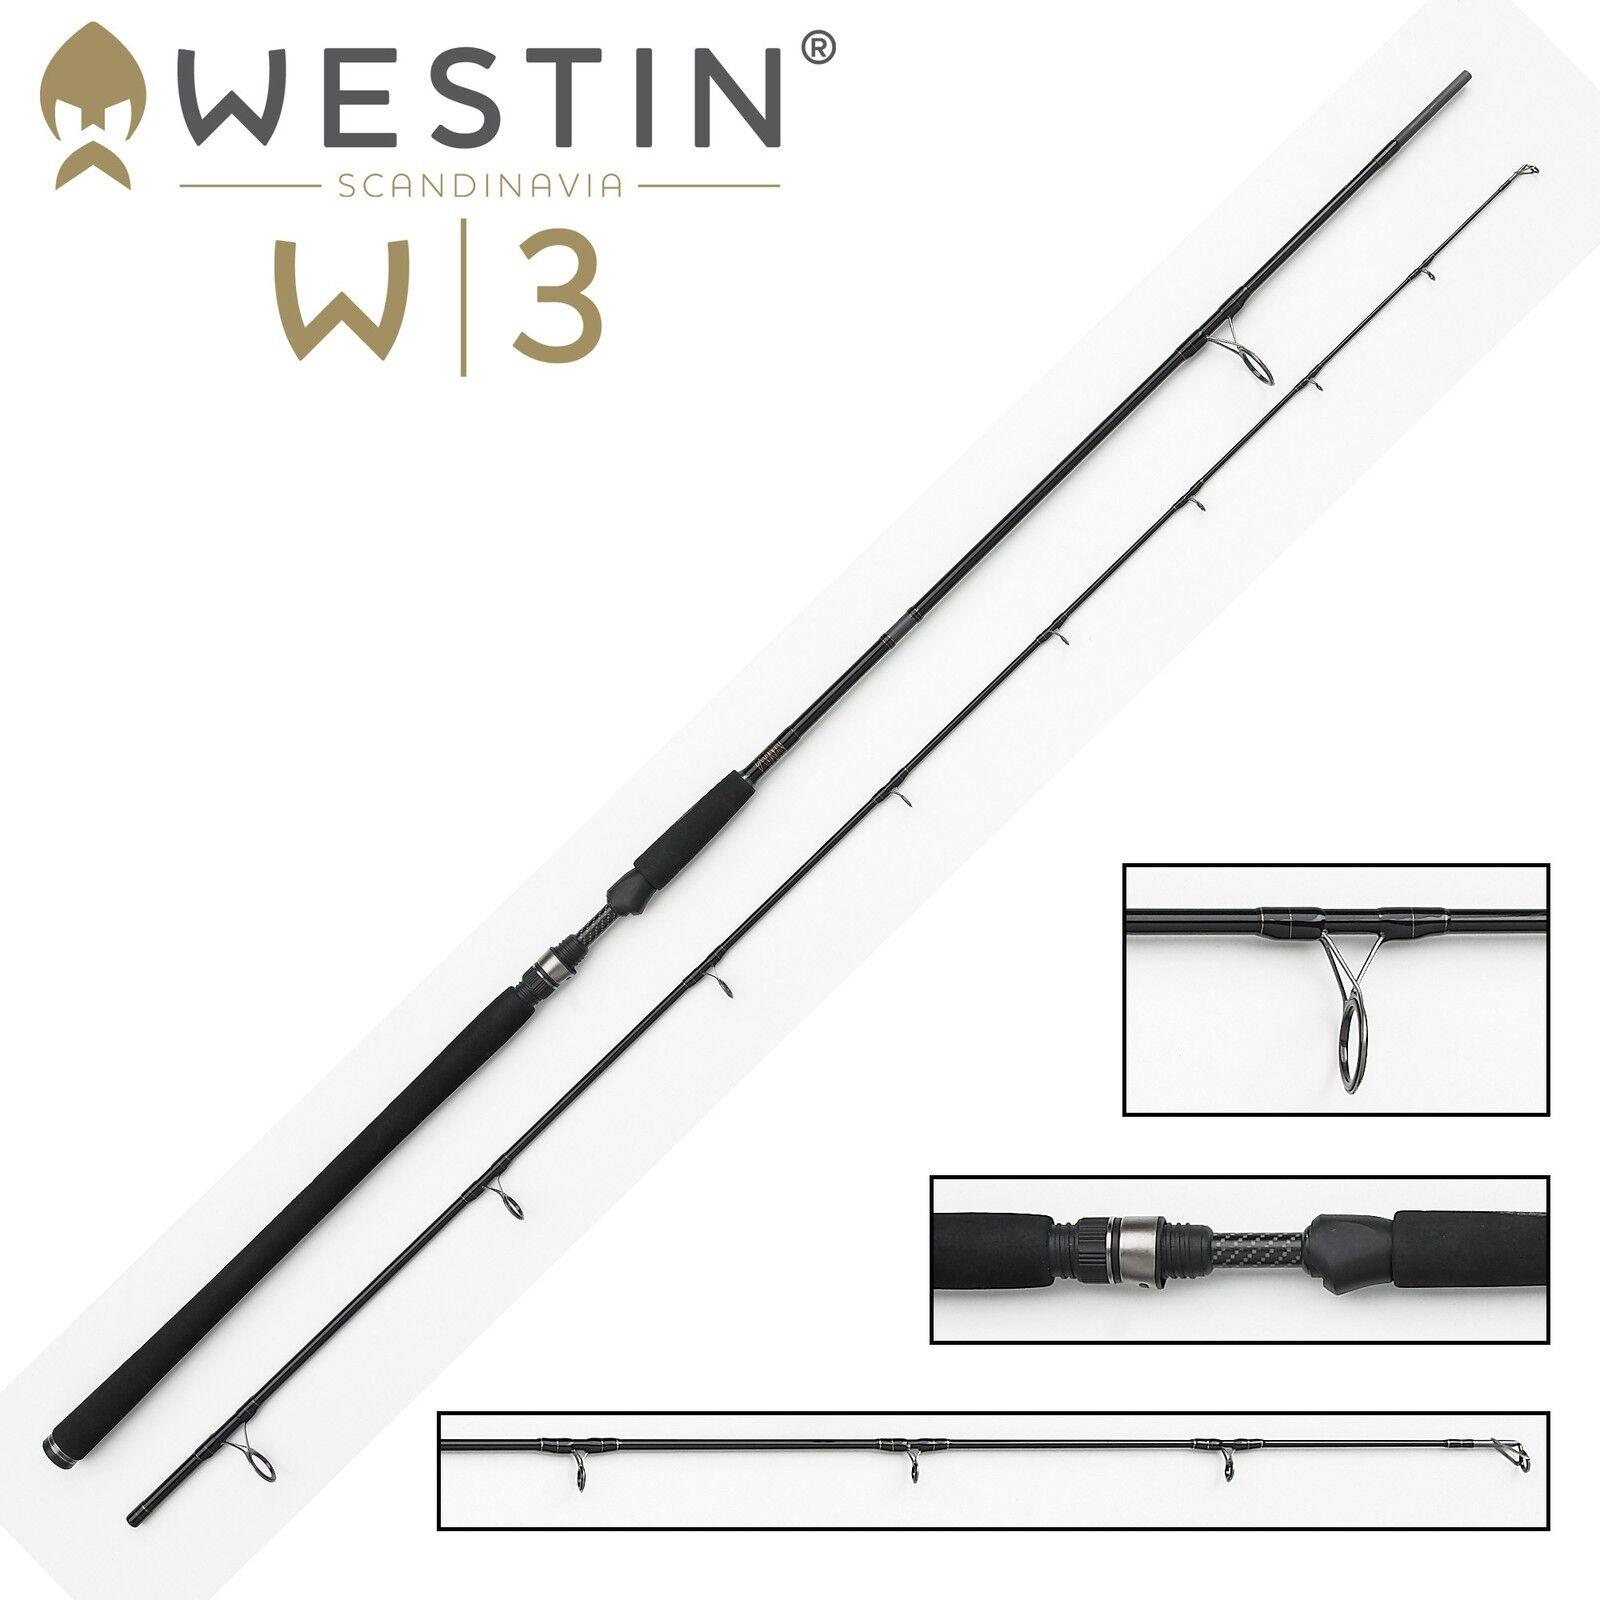 Westin W3 Powercast XXH 308cm 40-130g- Spinnrute, Hechtrute Hechtrute Hechtrute für Kunstköder bbe2e0